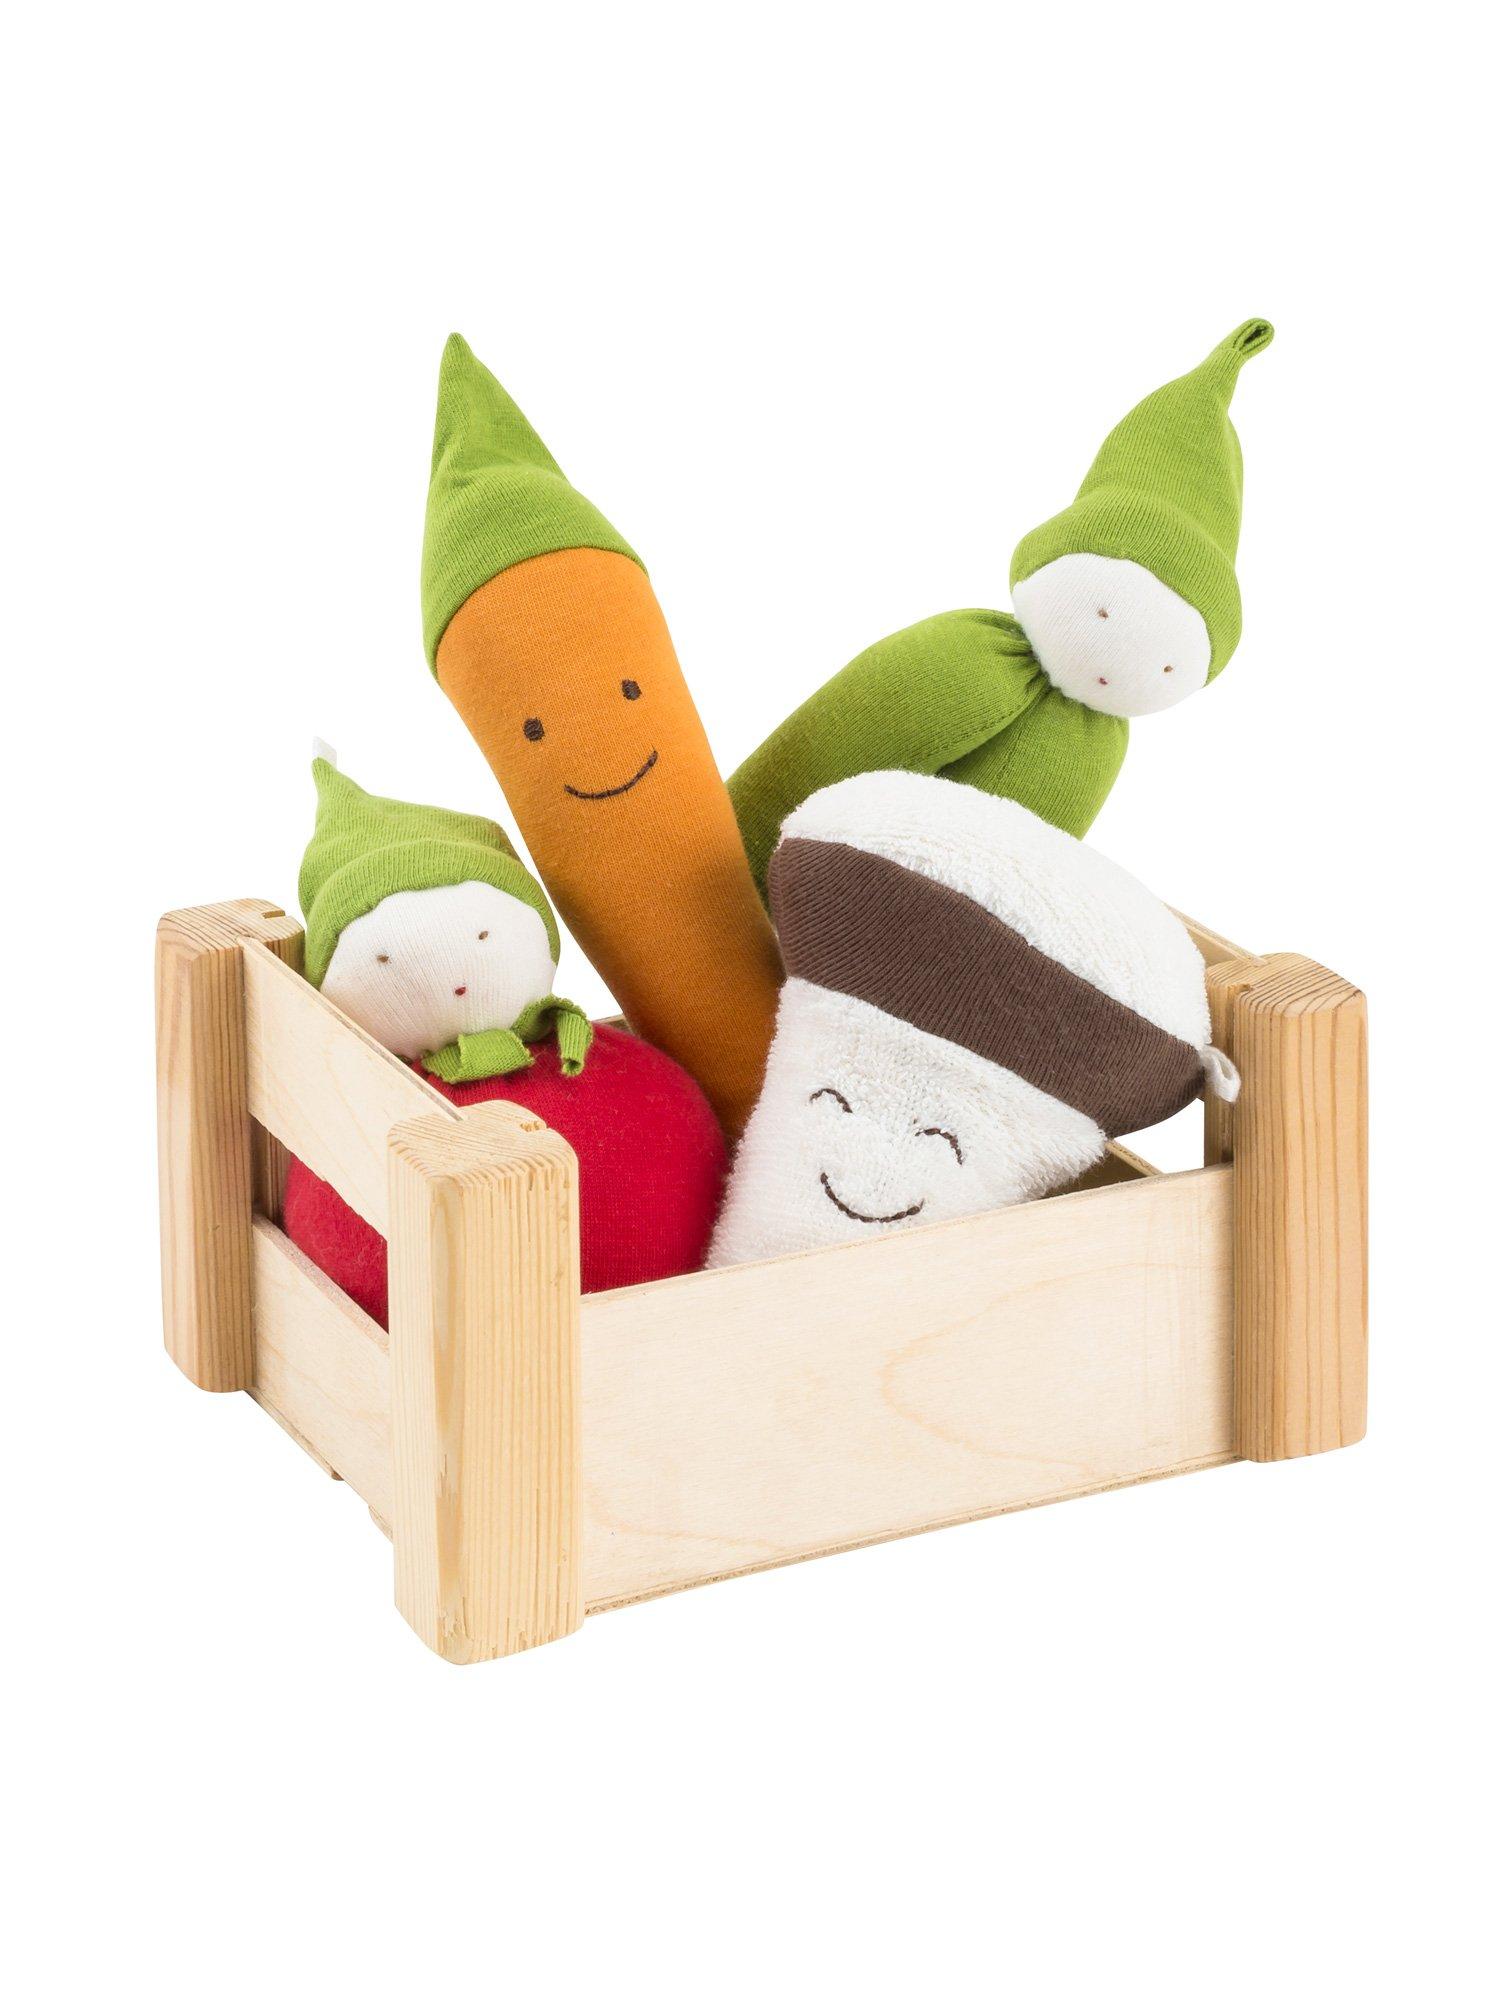 veggie-crate-329-organic-cotton-stuffed-fruit-veggie-toys.jpg